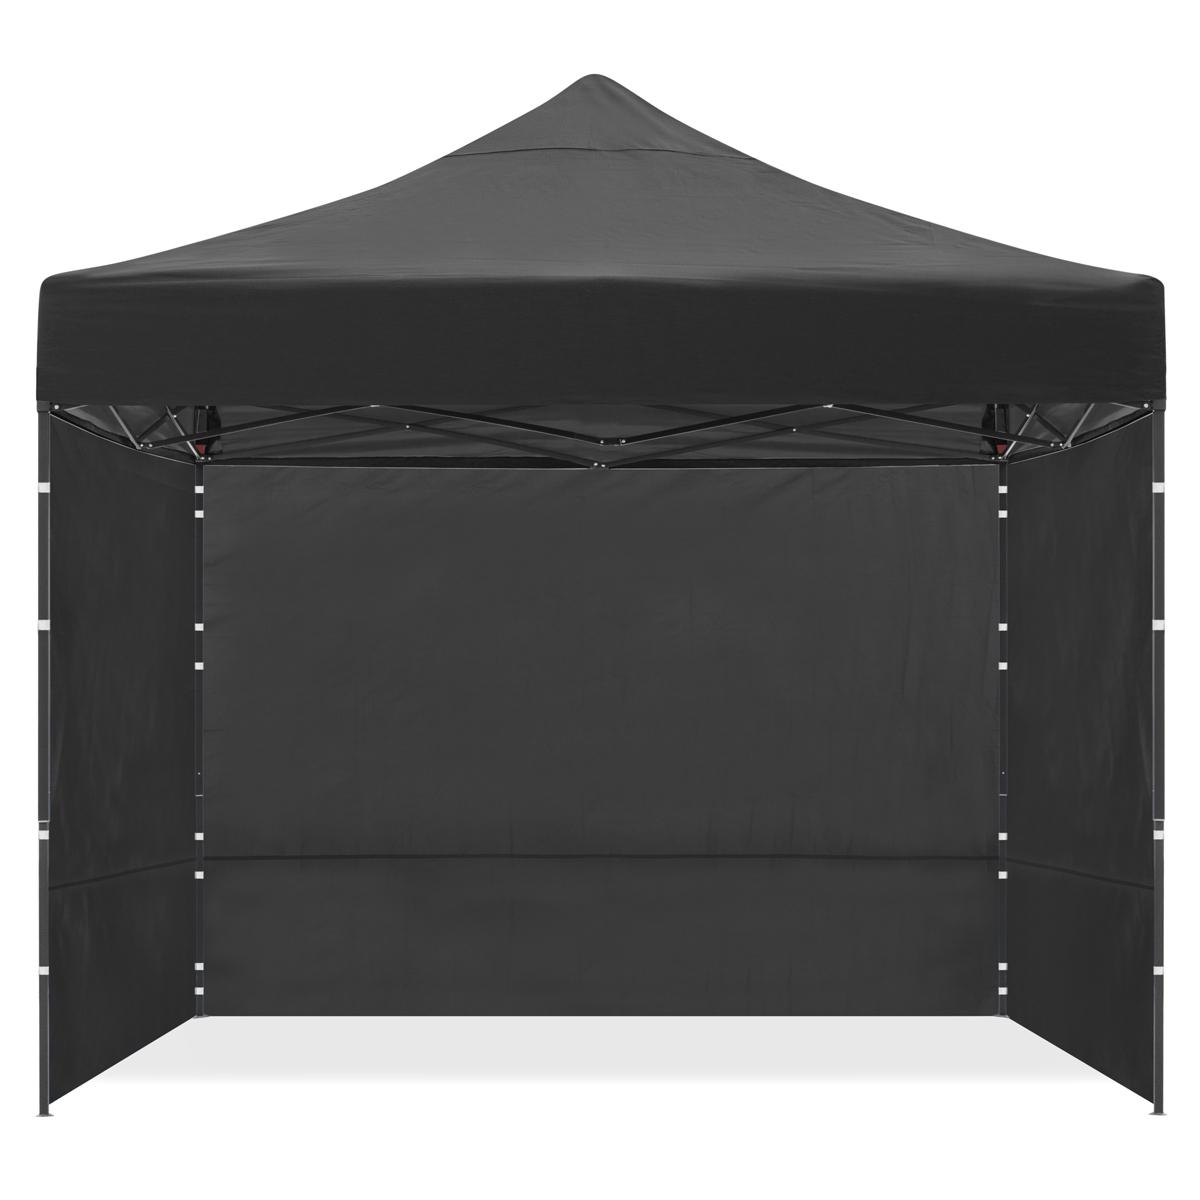 miniatura 19 - Carpa plegable 3x3 impermeable, carpas para exteriores, jardin o terraza